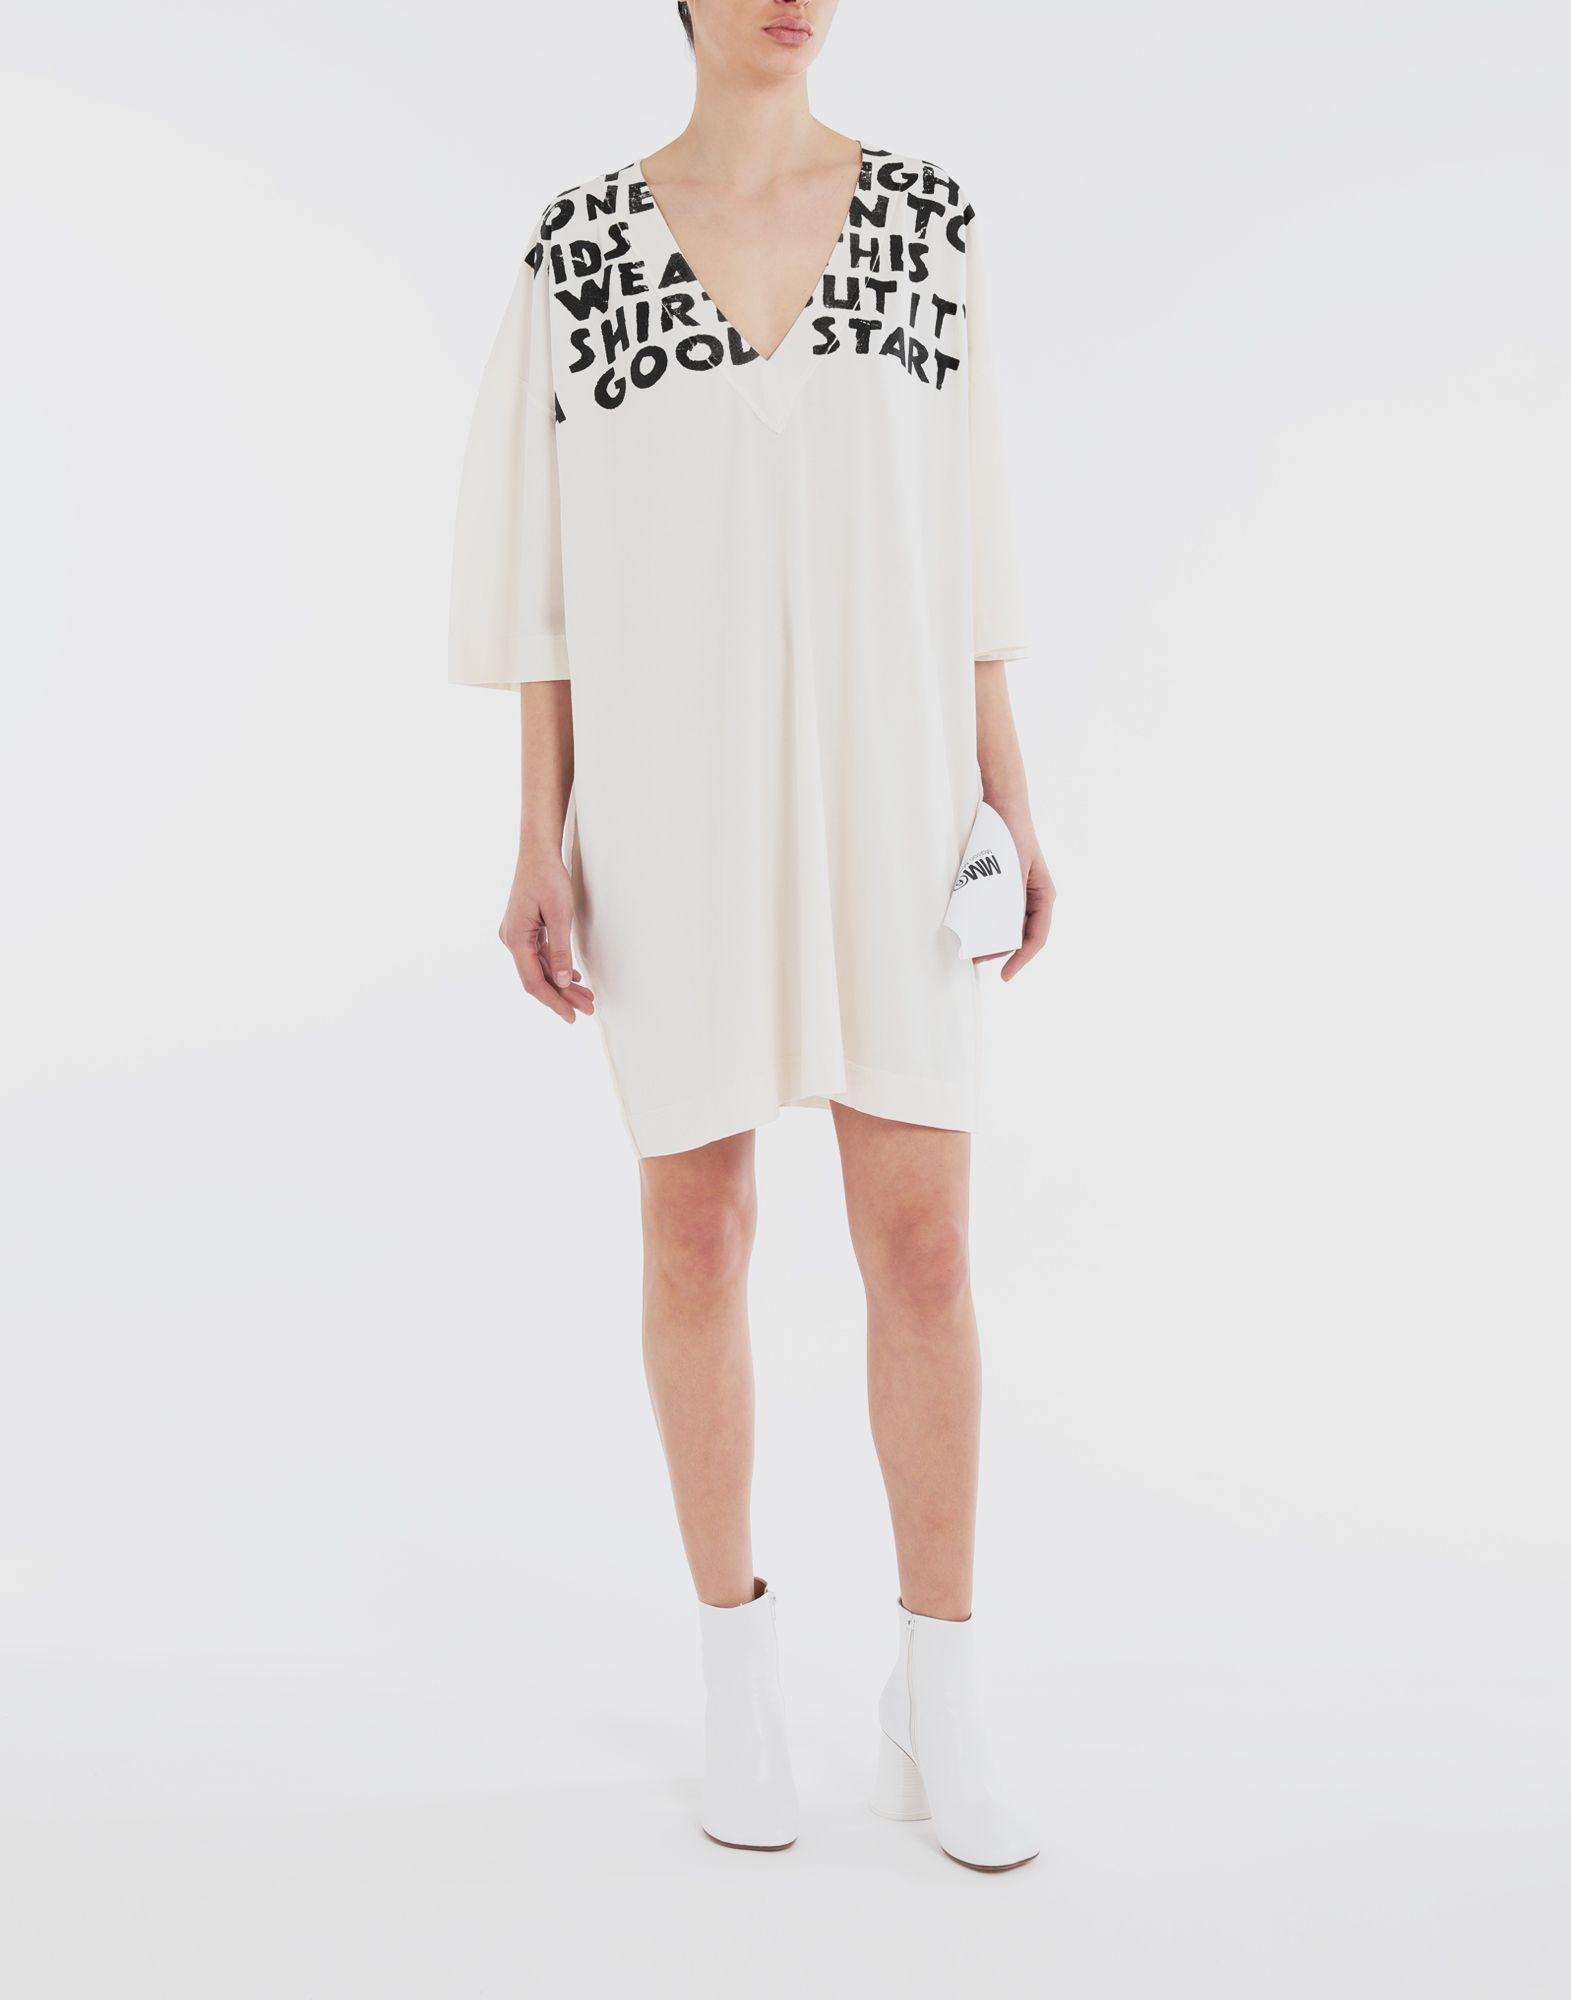 MM6 MAISON MARGIELA Charity AIDS-print dress Short dress Woman r